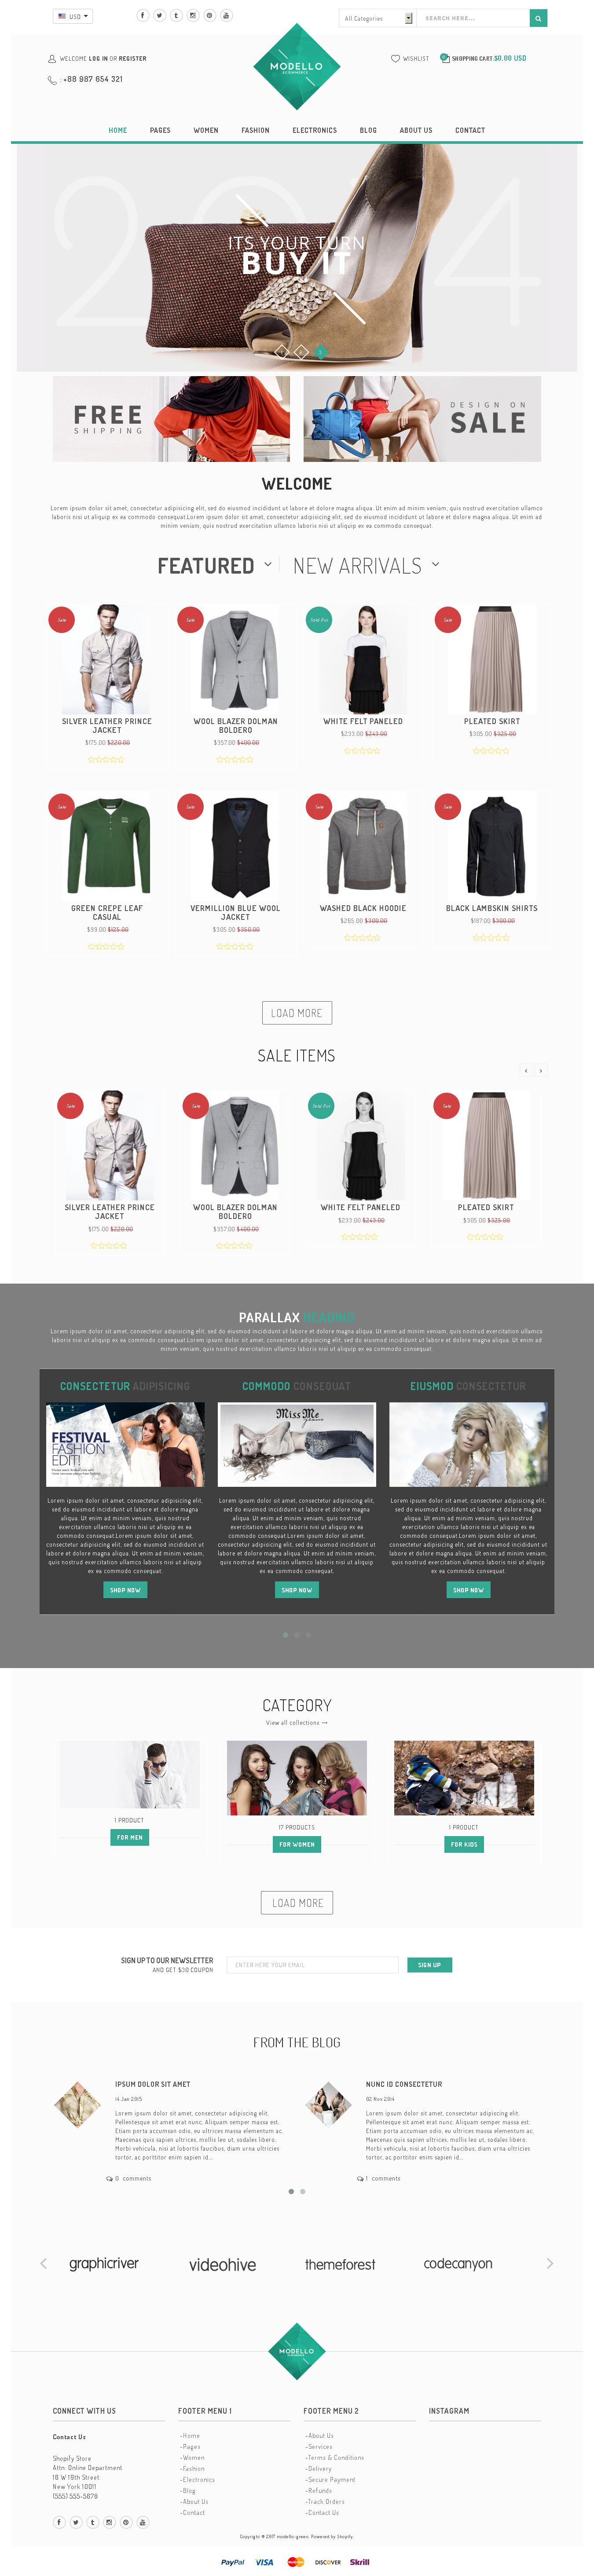 Shopify Theme for Art Work top - Modello - Responsive Shopify Theme